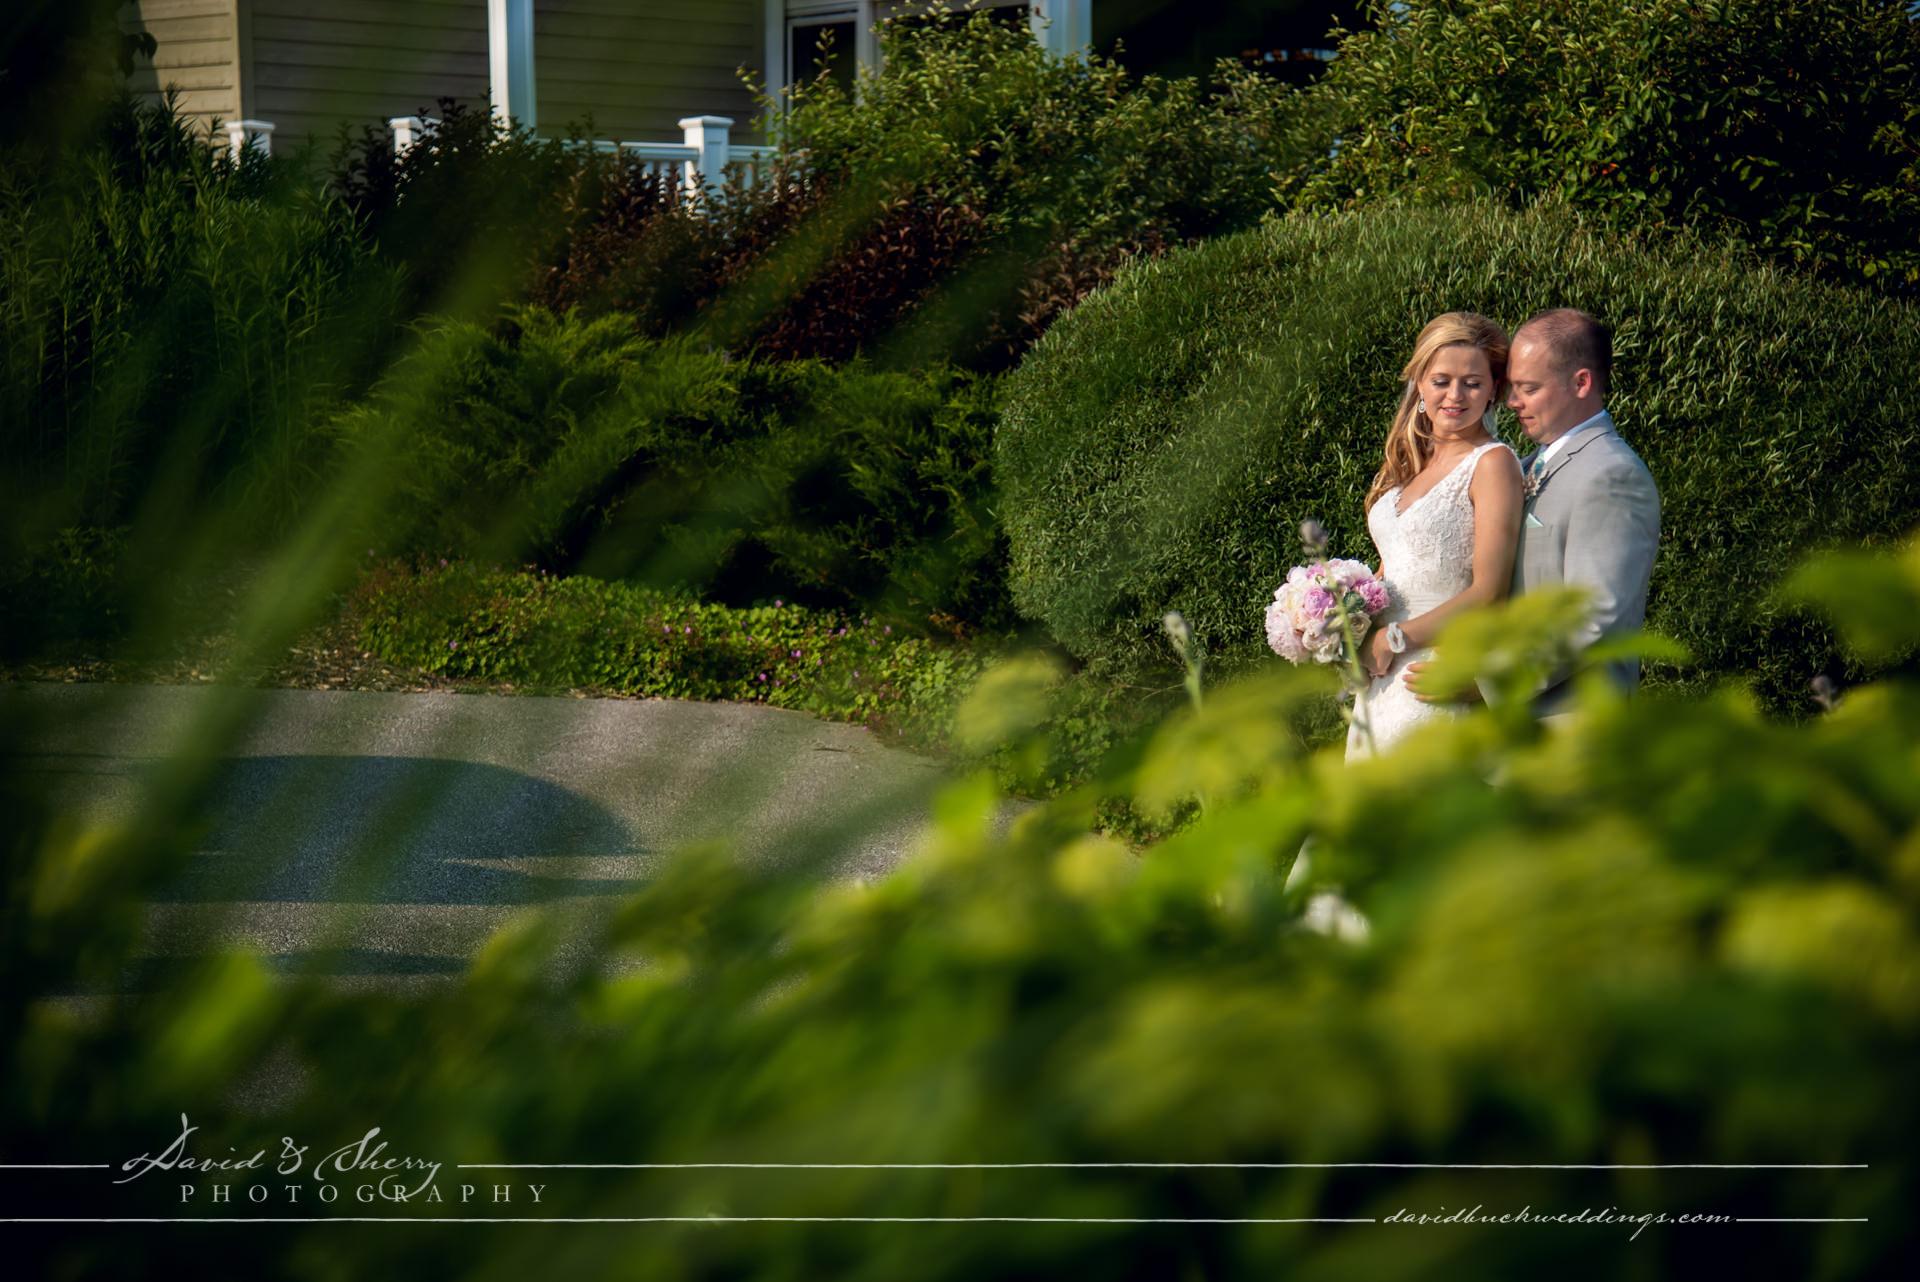 Cobble_Beach_Wedding_Photography_Owen_Sound_01